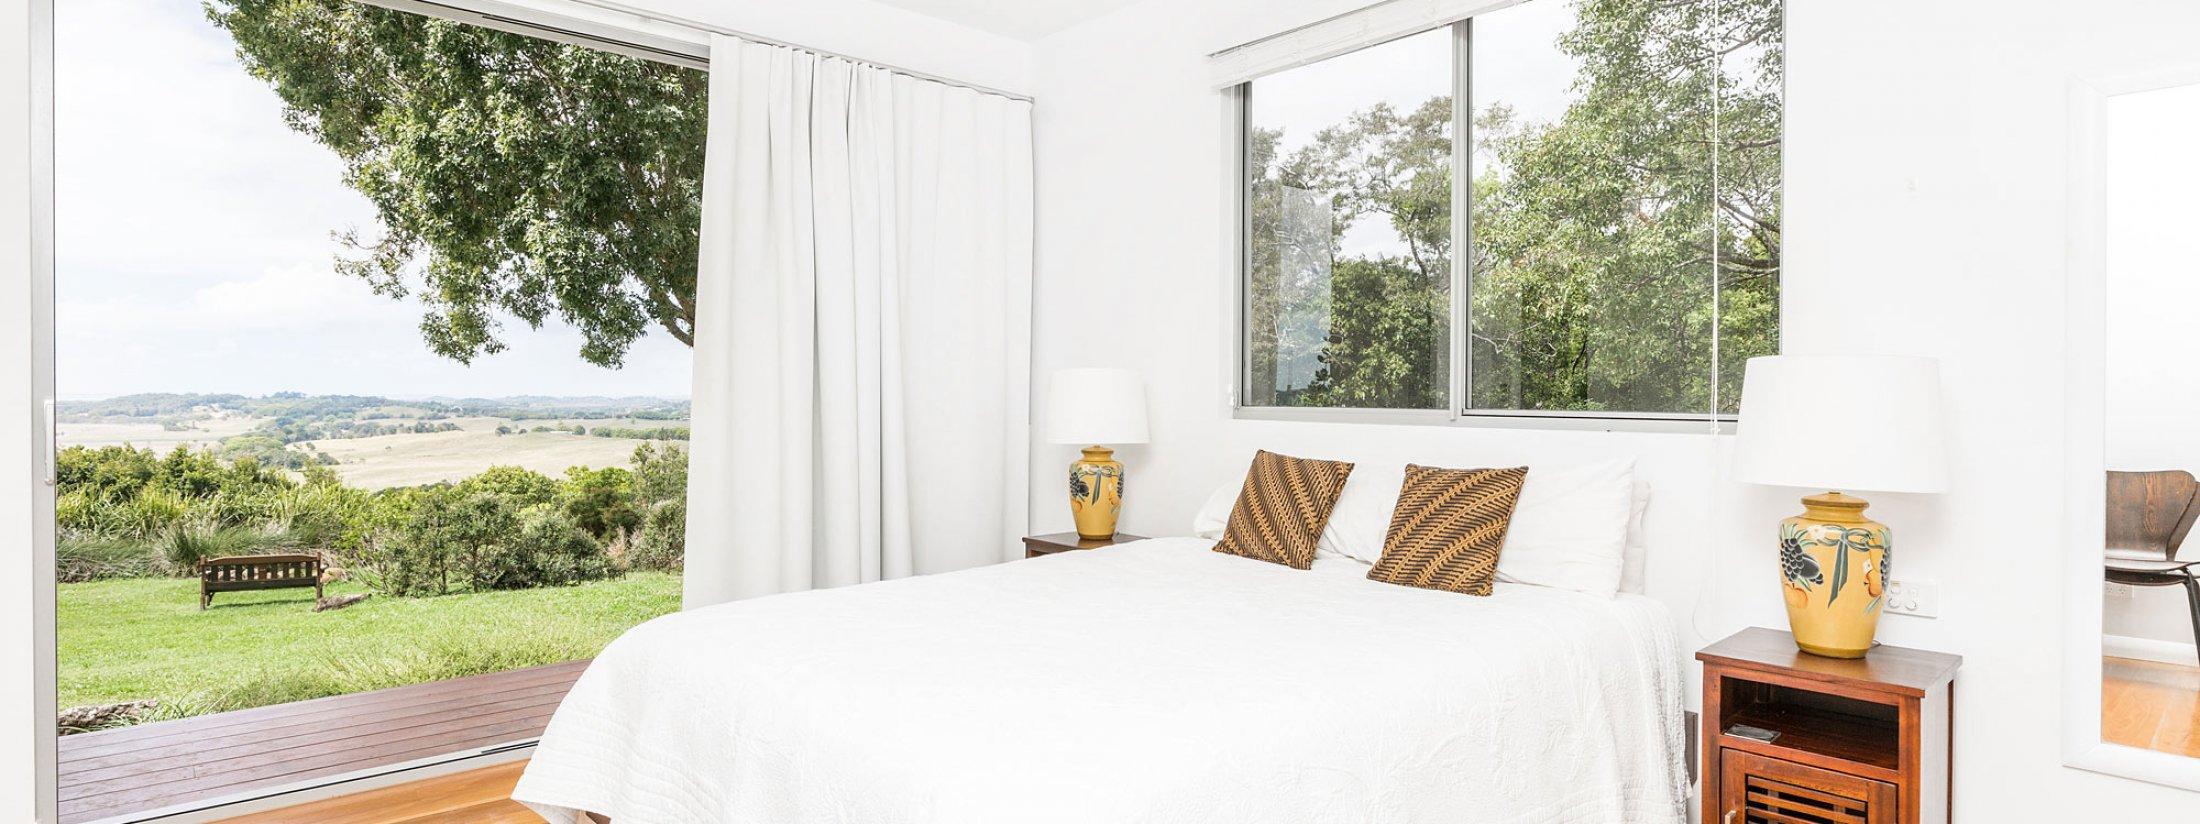 Jali Burugar - Byron Bay - Extra Bedroom 2e